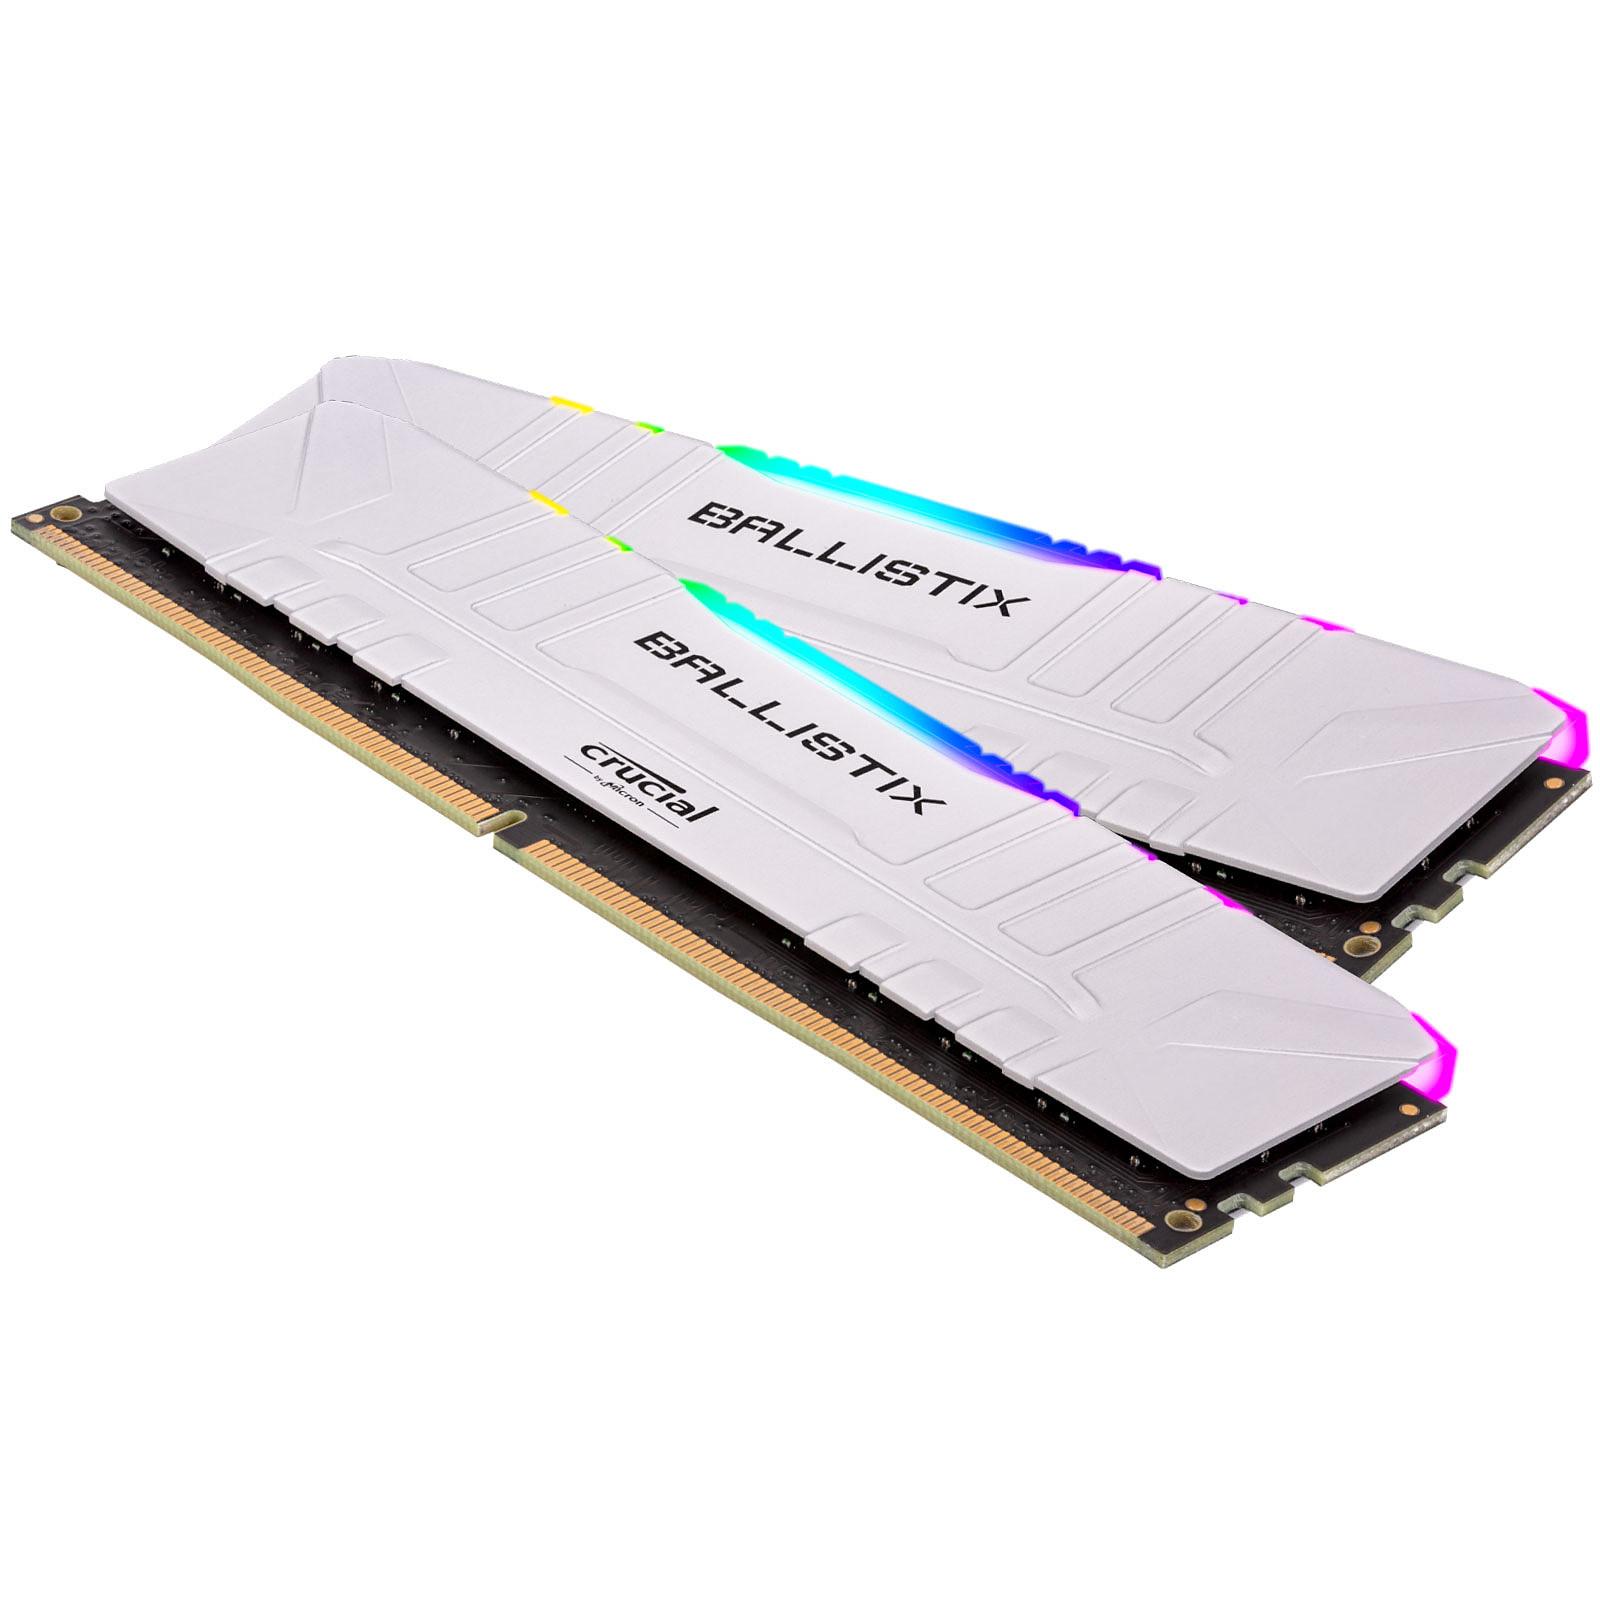 Ballistix White RGB DDR4 16 Go (2 x 8 Go) 3000 MHz CL15